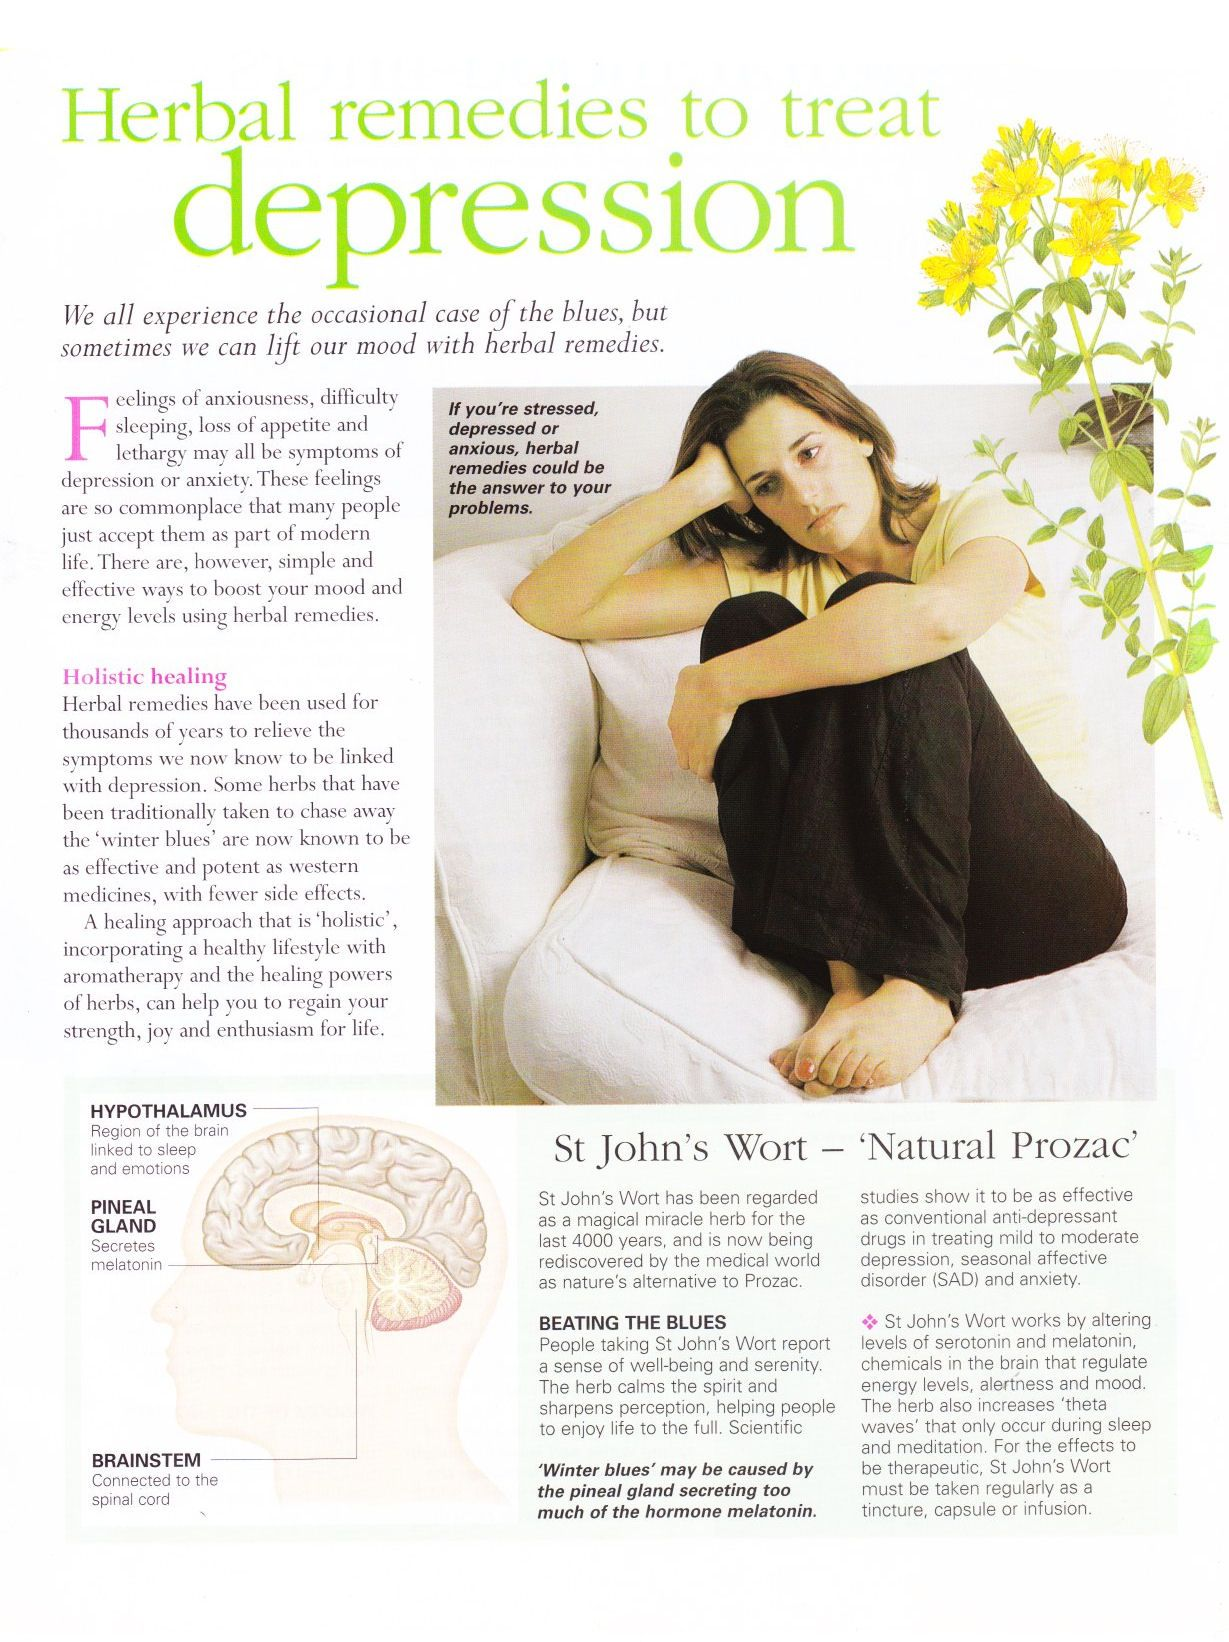 Herbal remedies to treat depression